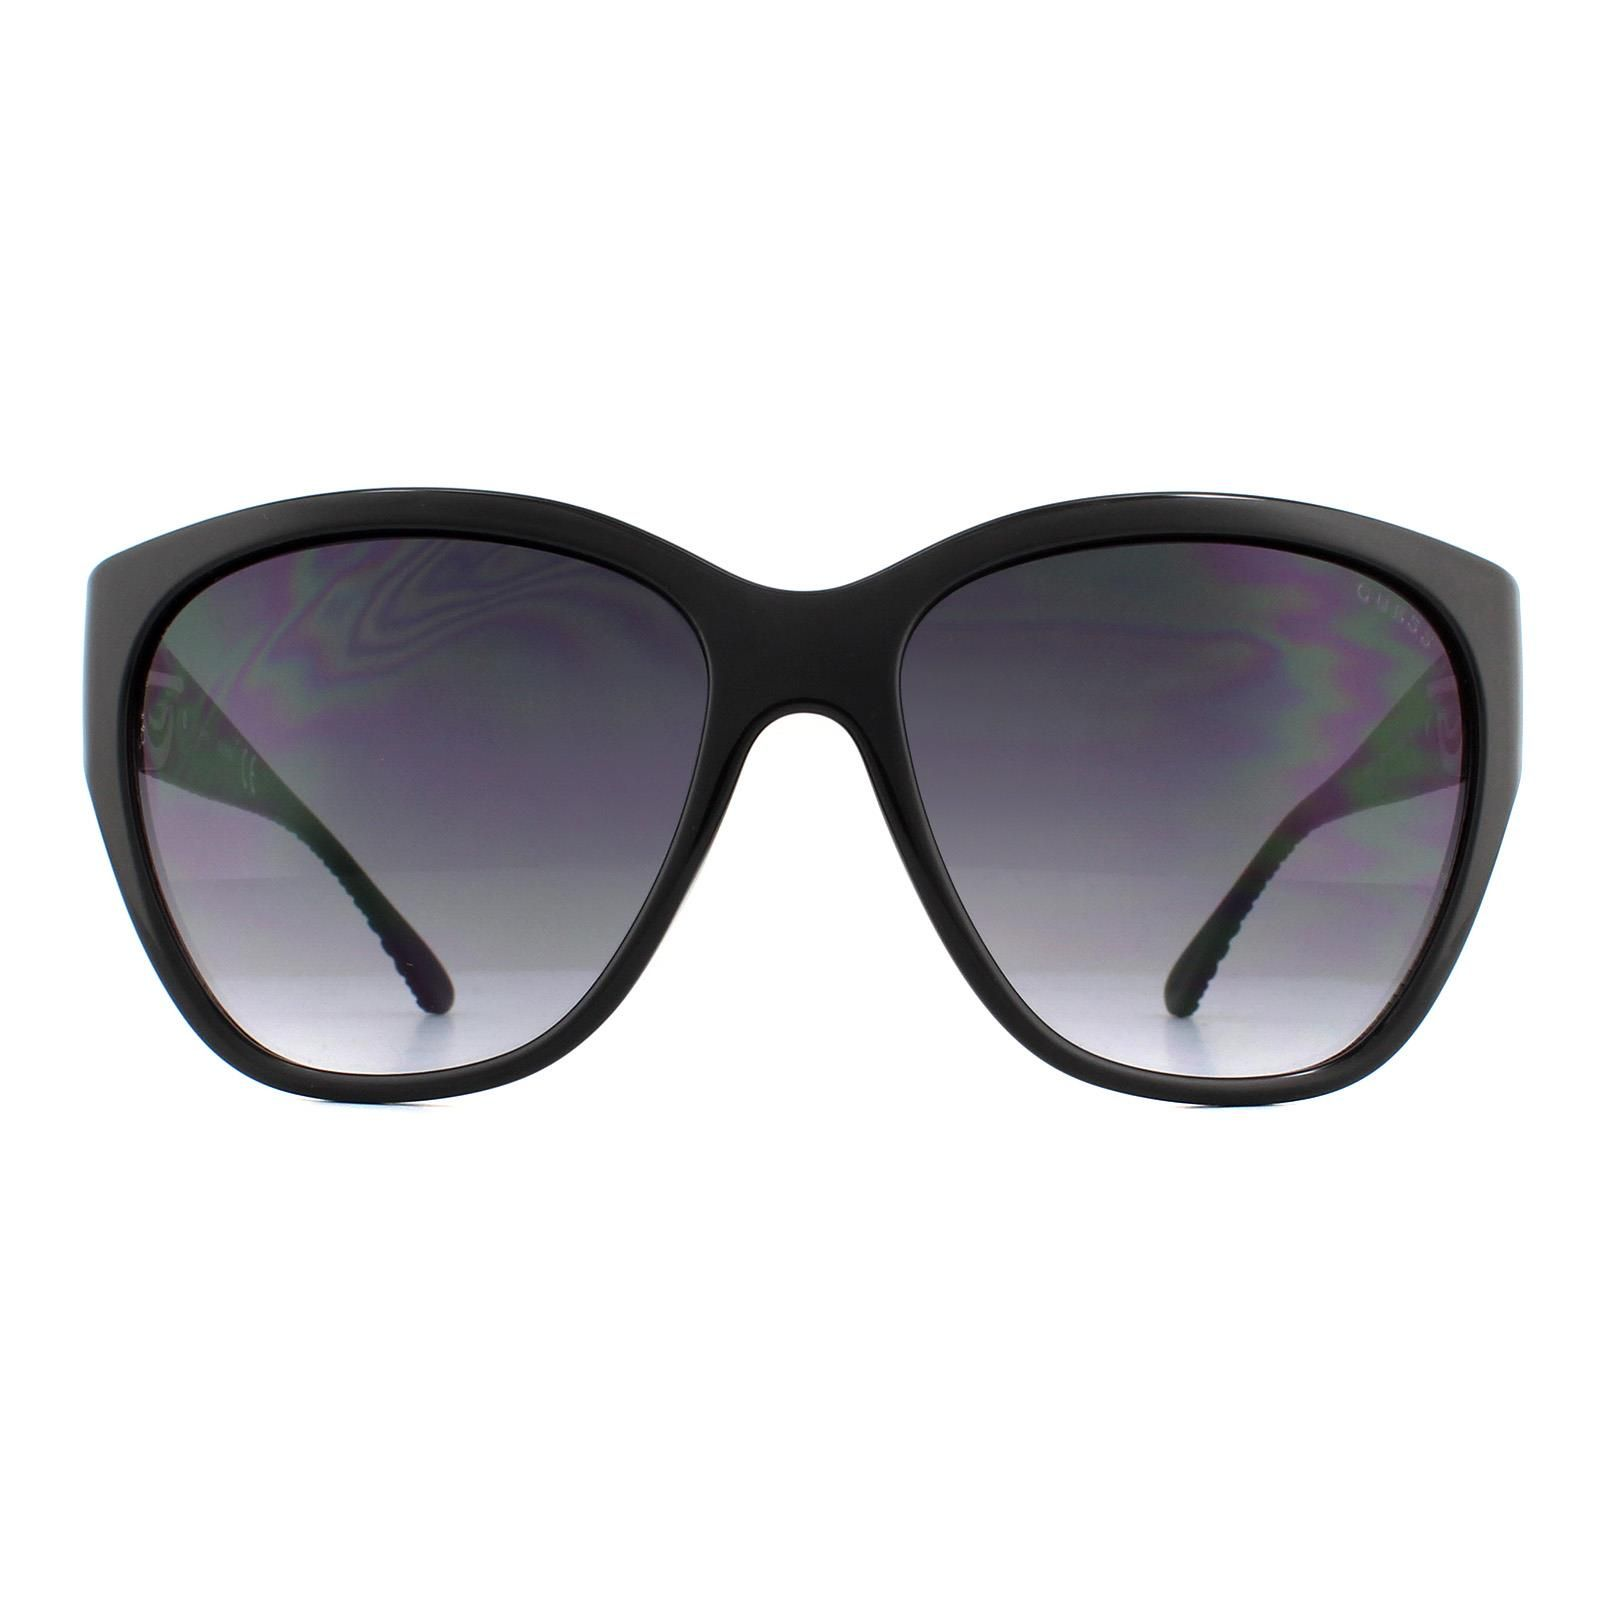 Guess Sunglasses GU7348 C38 Black Grey Gradient